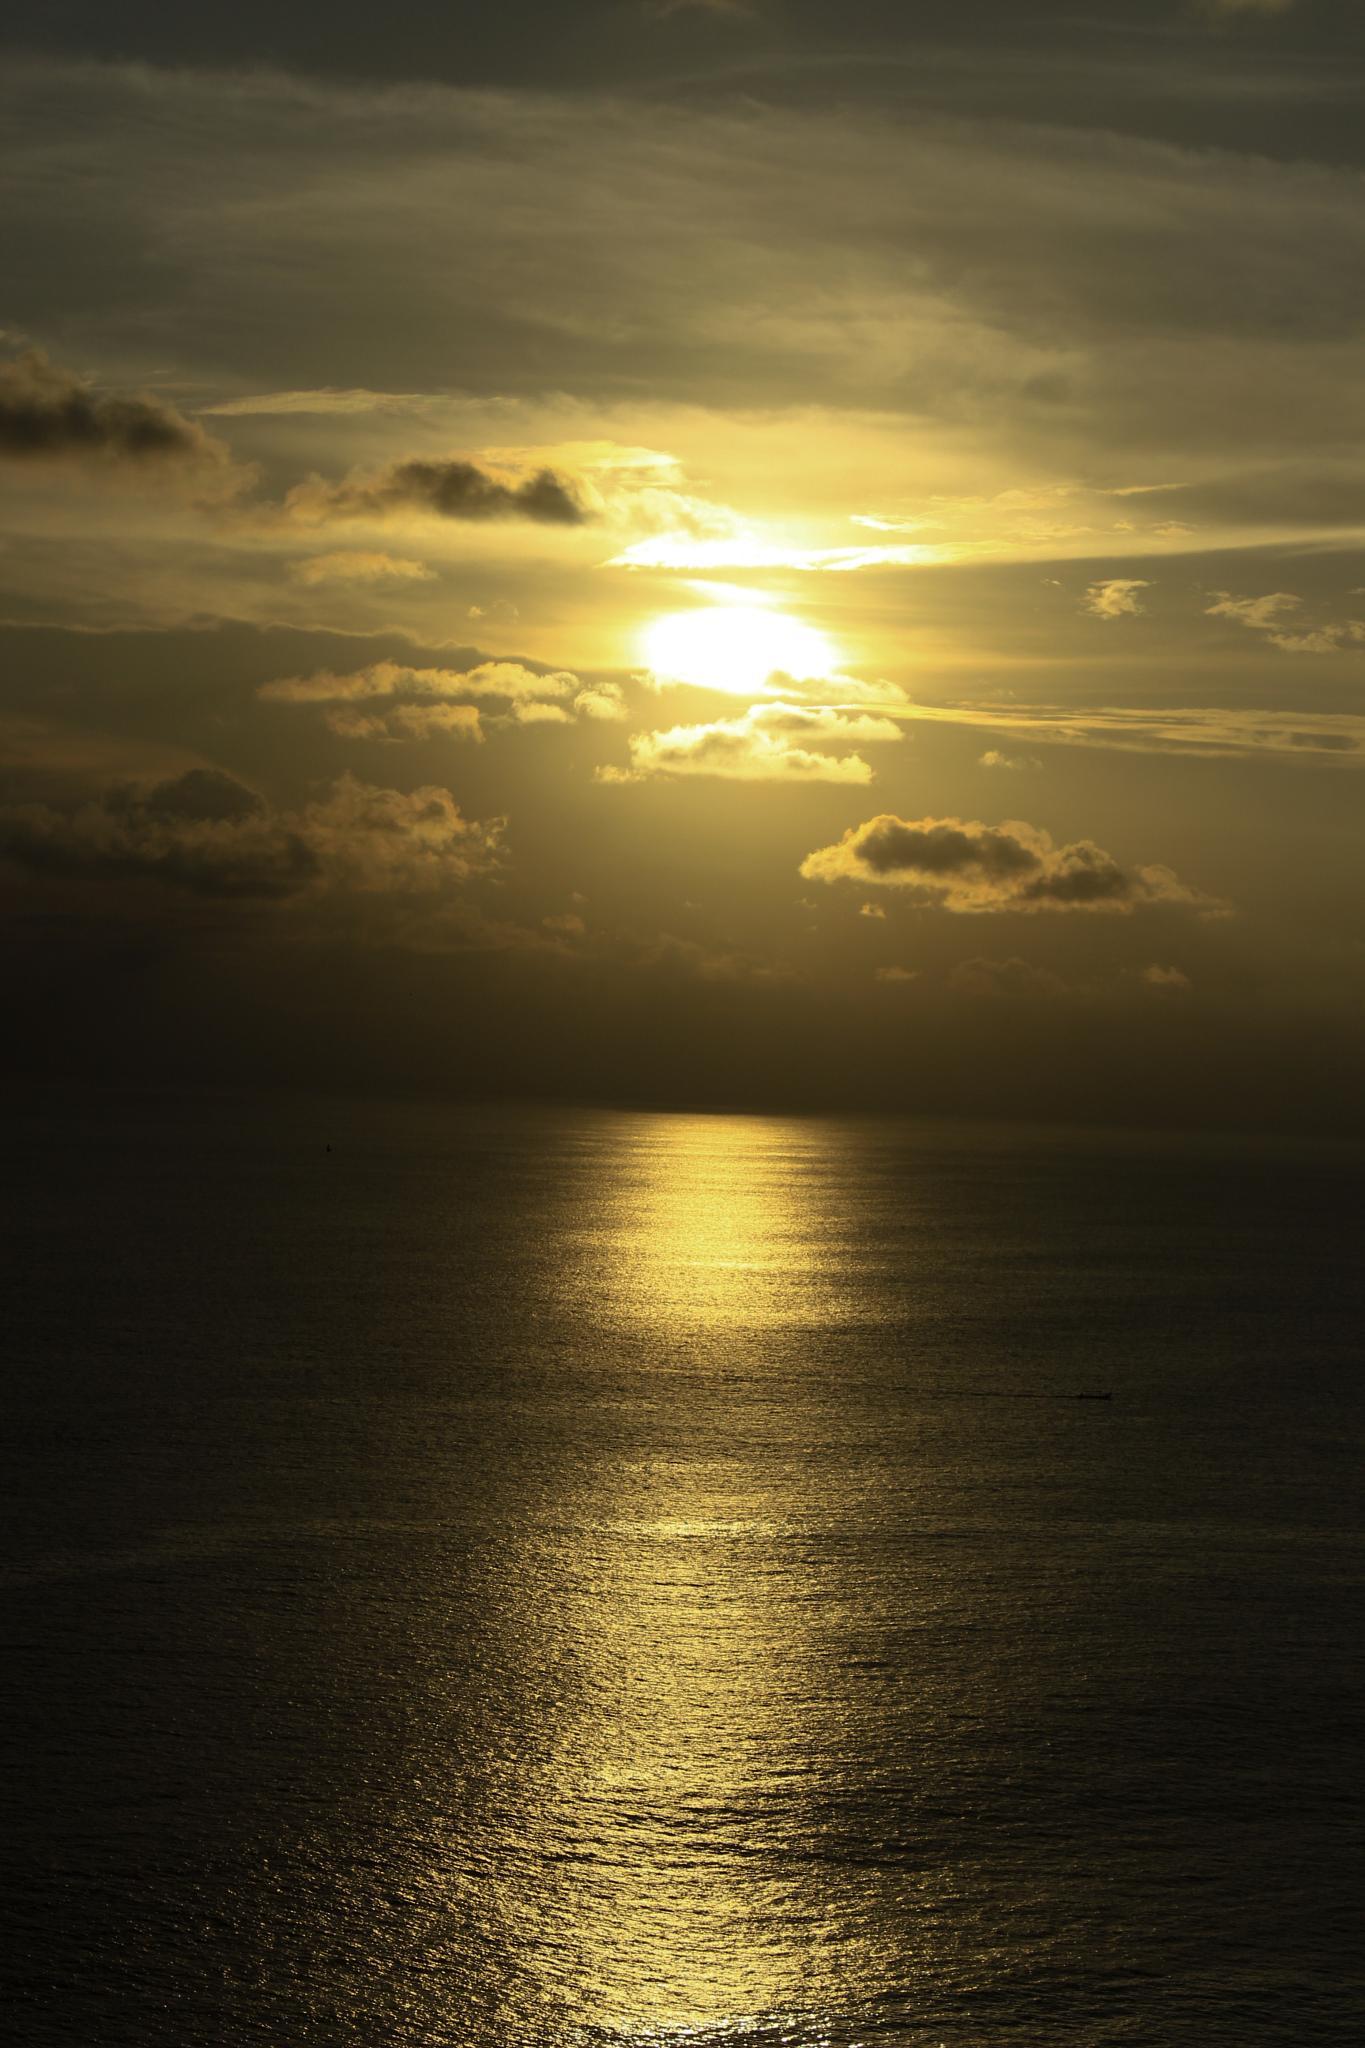 Yellow Sunset by Angga Raditya (ZweiBlack)